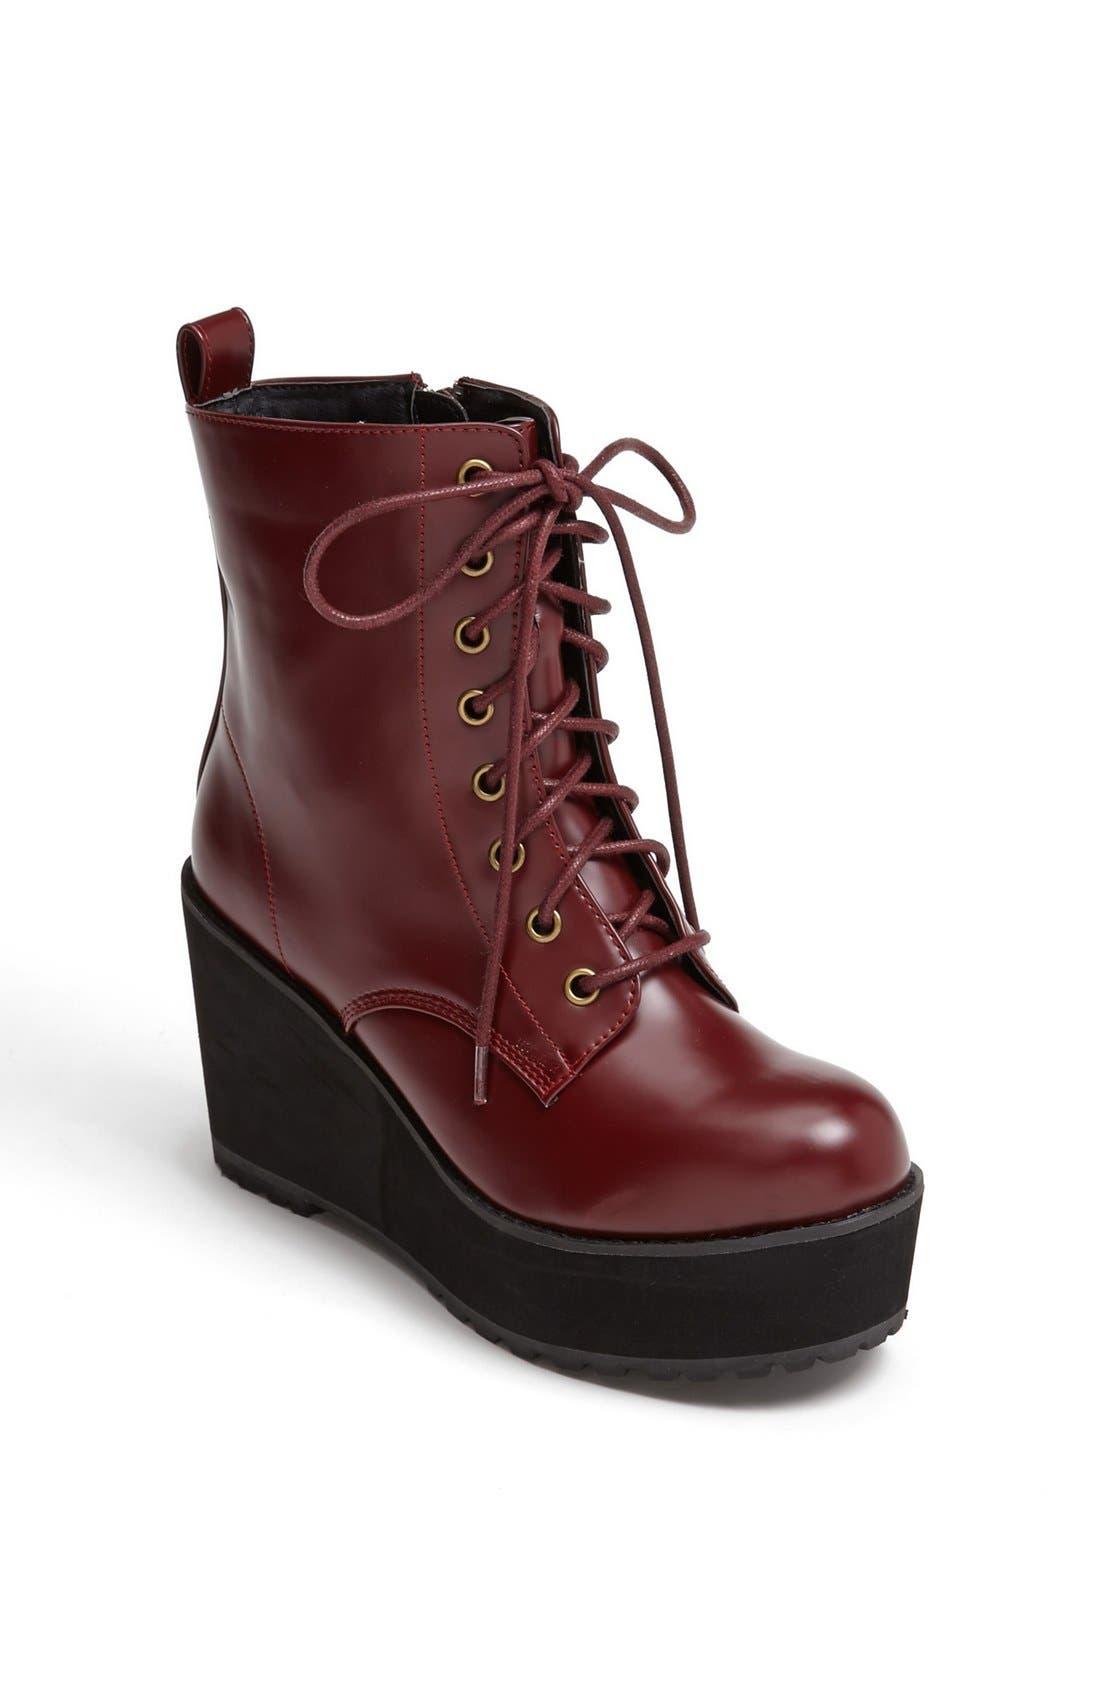 Main Image - Shellys London 'Skardalo' Boot